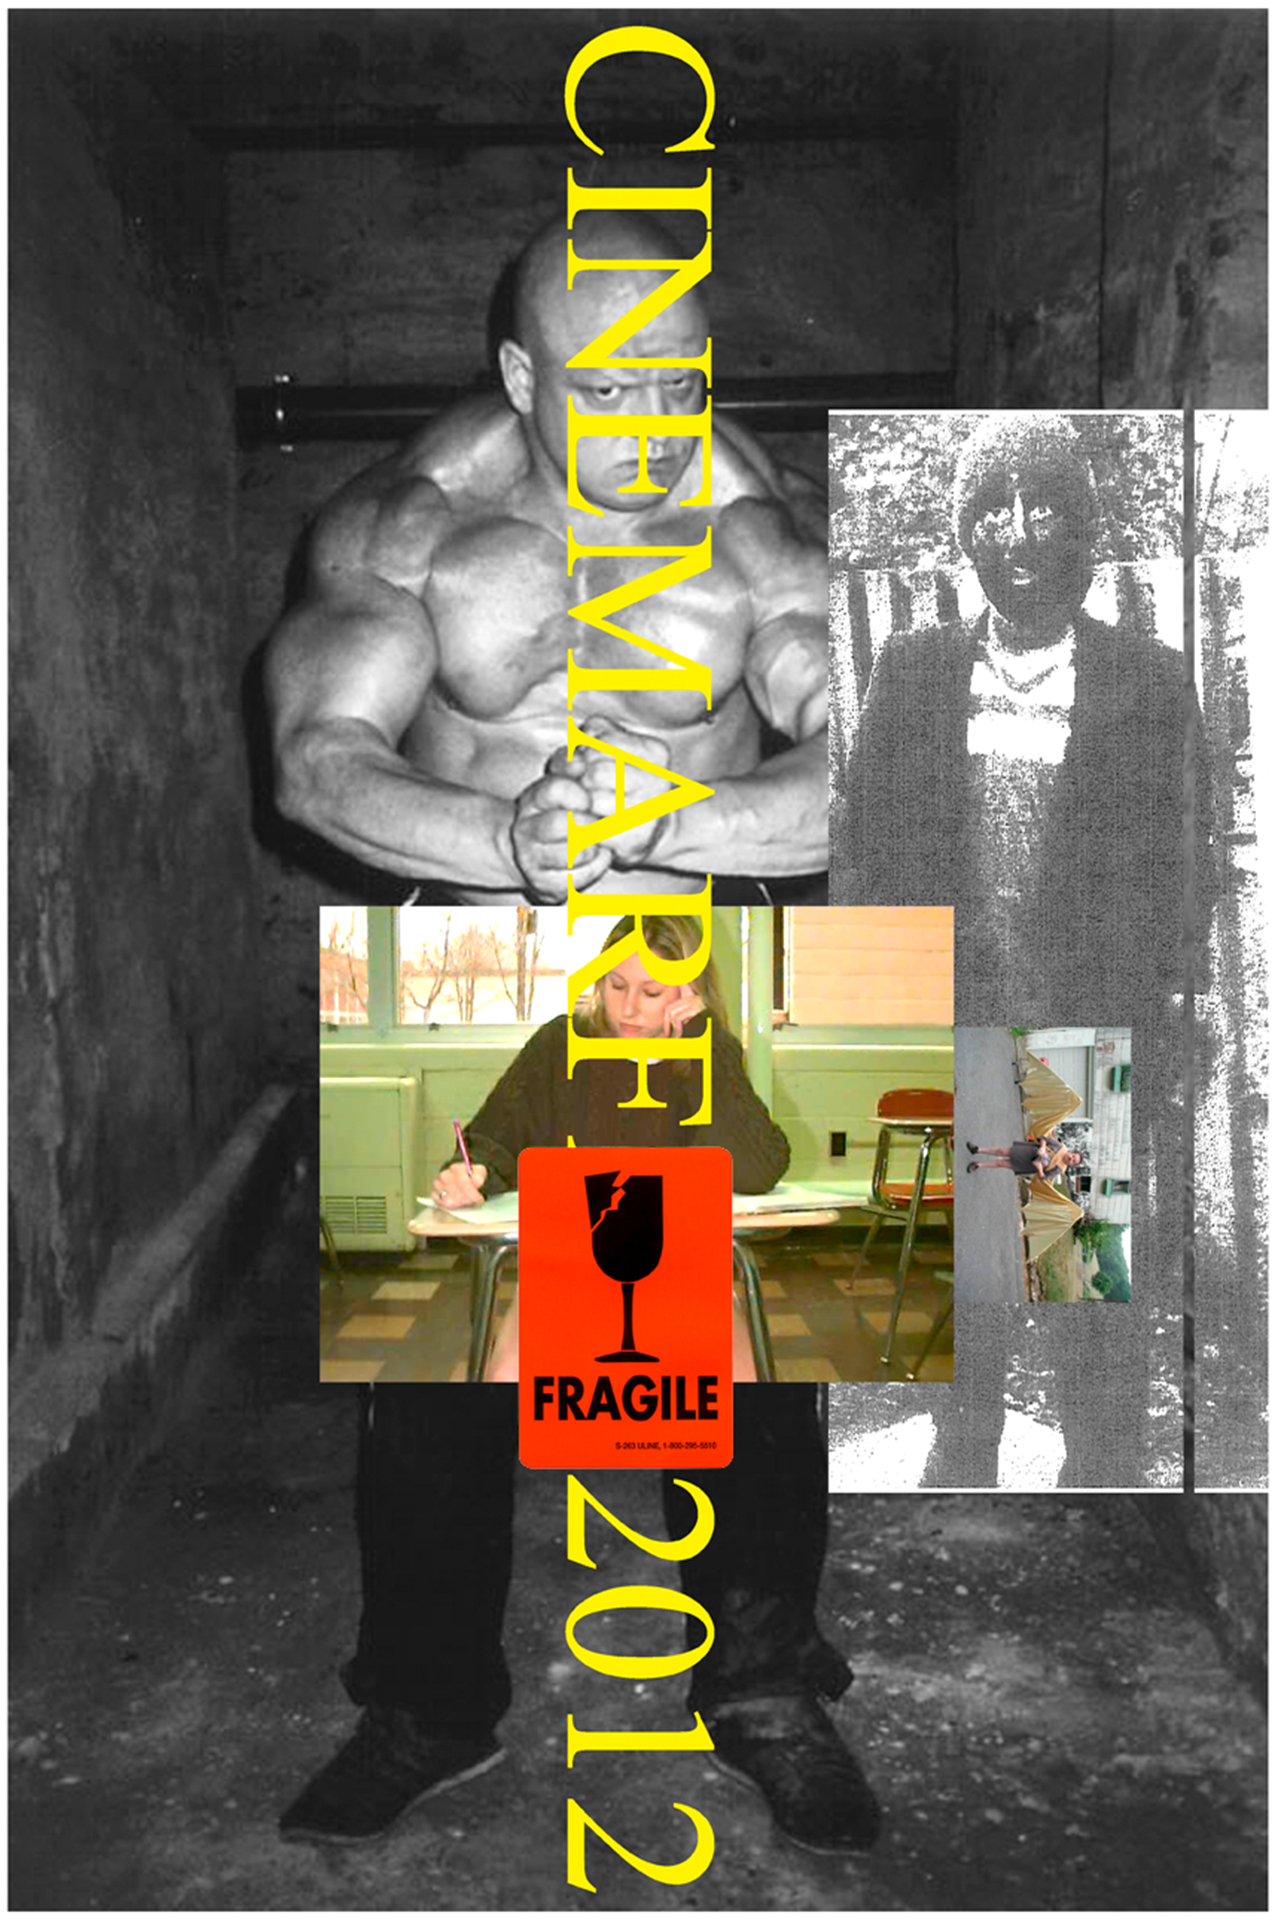 cinemarfa-poster-2012.jpg